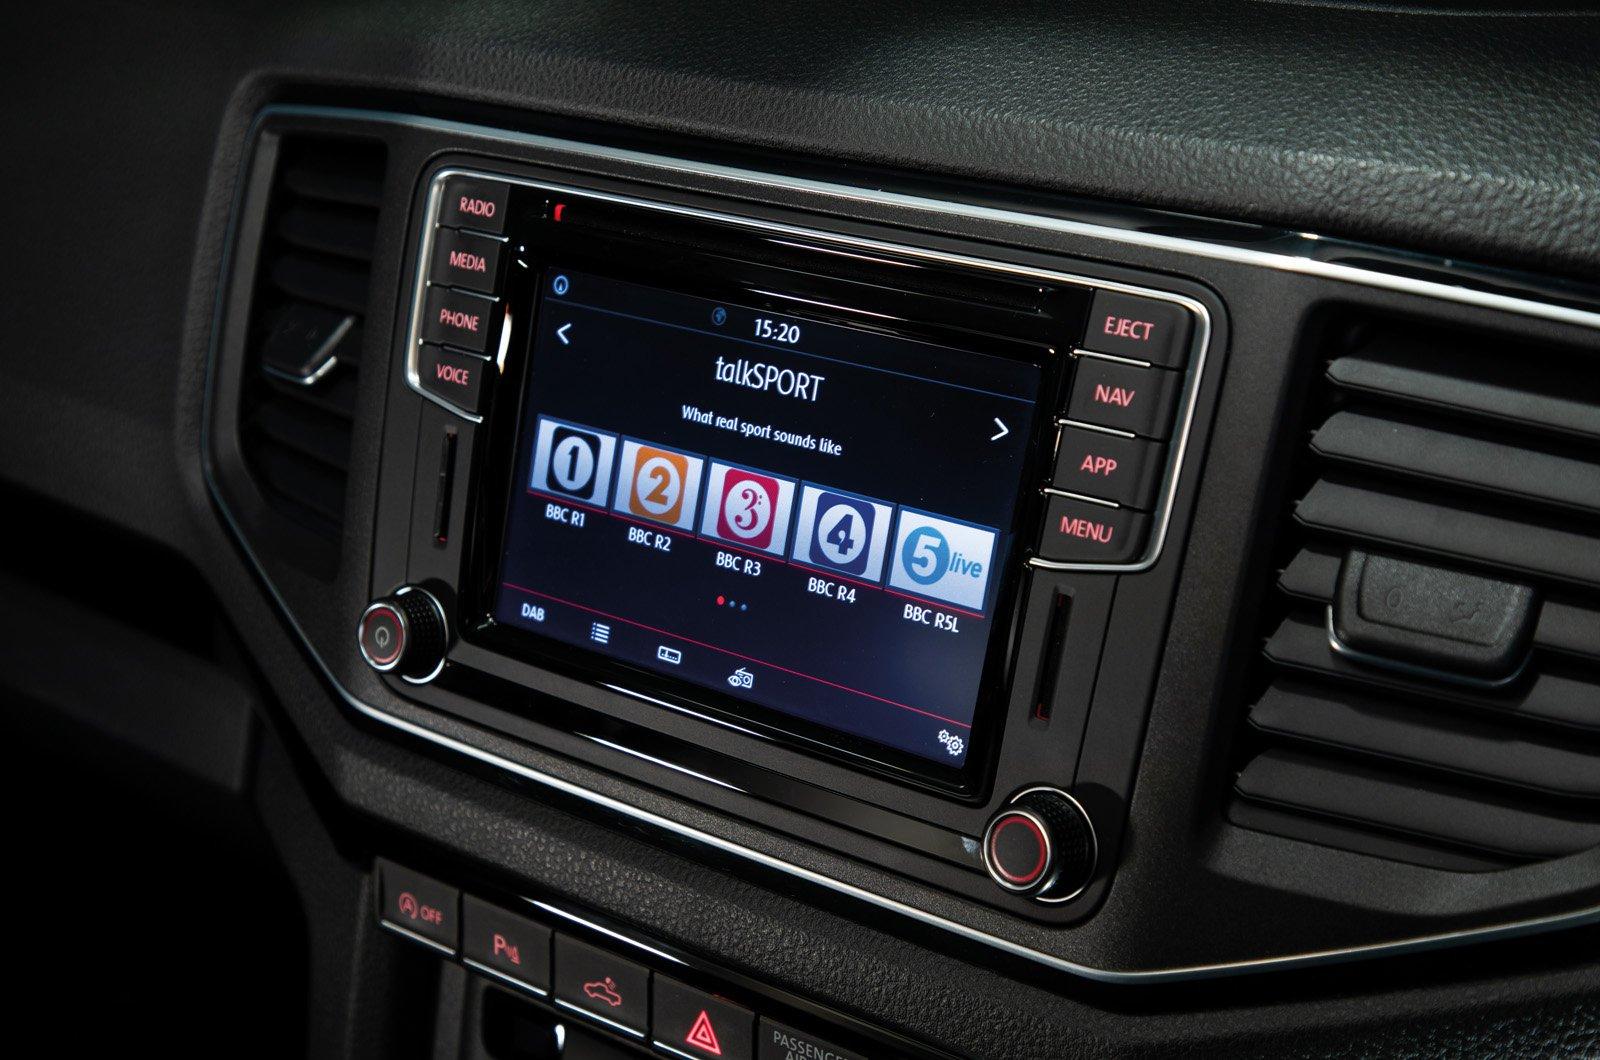 Volkswagen Amarok touchscreen - 69 plate